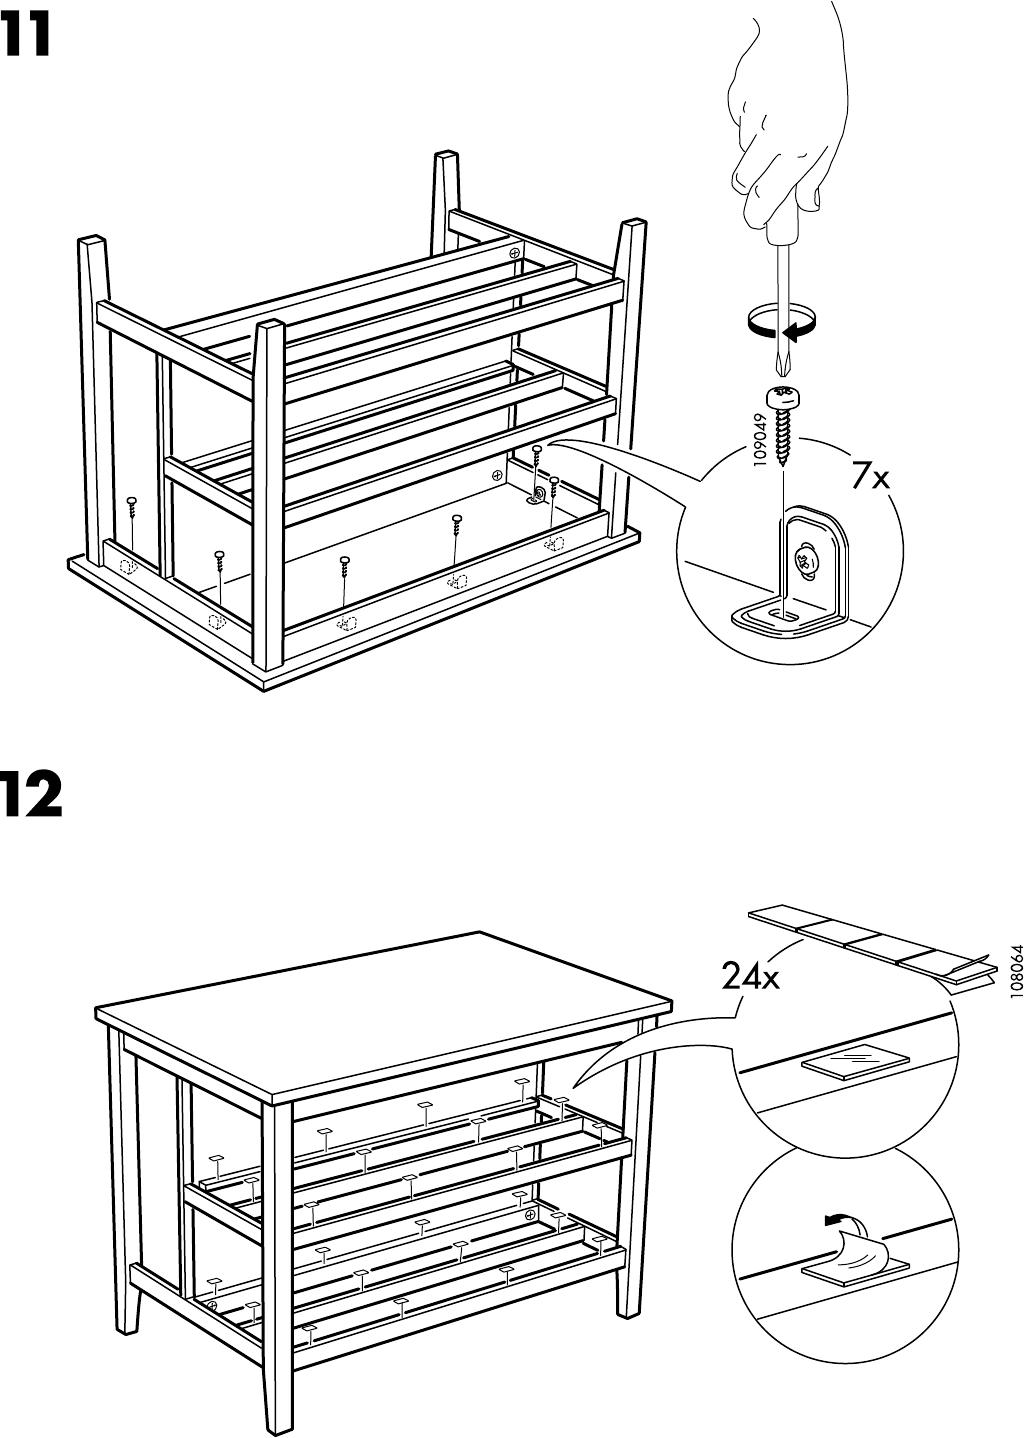 Keukeneiland Ikea : Handleiding Ikea STENSTORP Keukeneiland (pagina 10 van 12) (Dansk